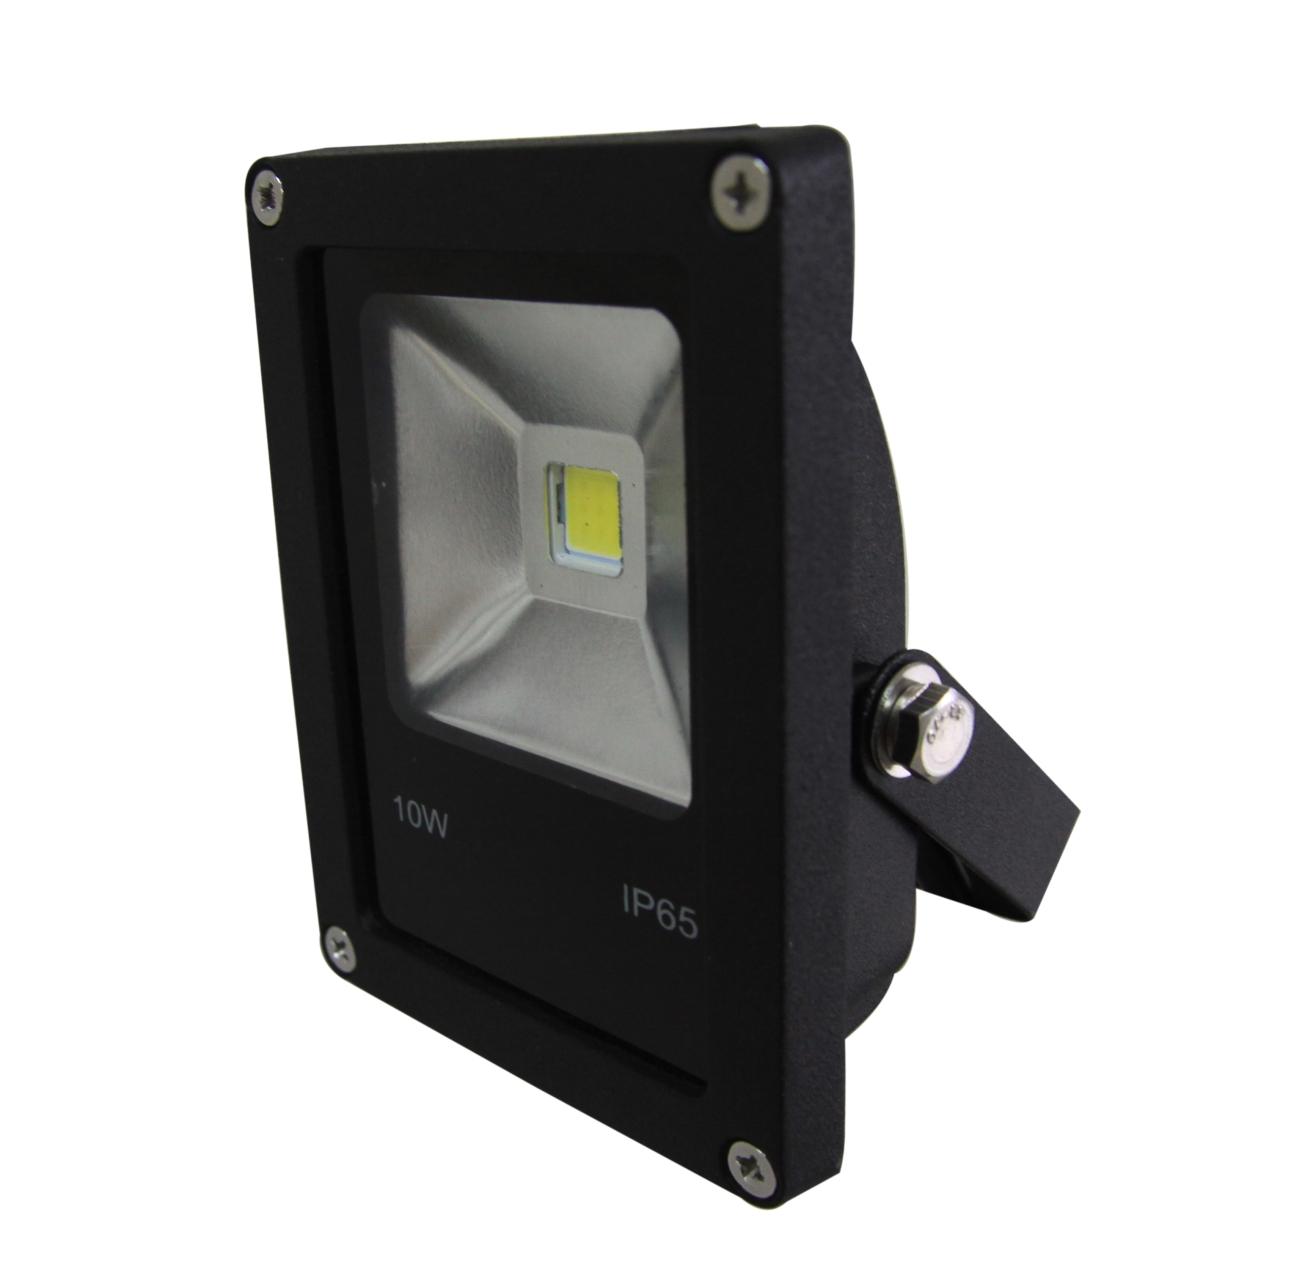 Proyectores led electroazuay cia ltda - Proyectores led exterior ...